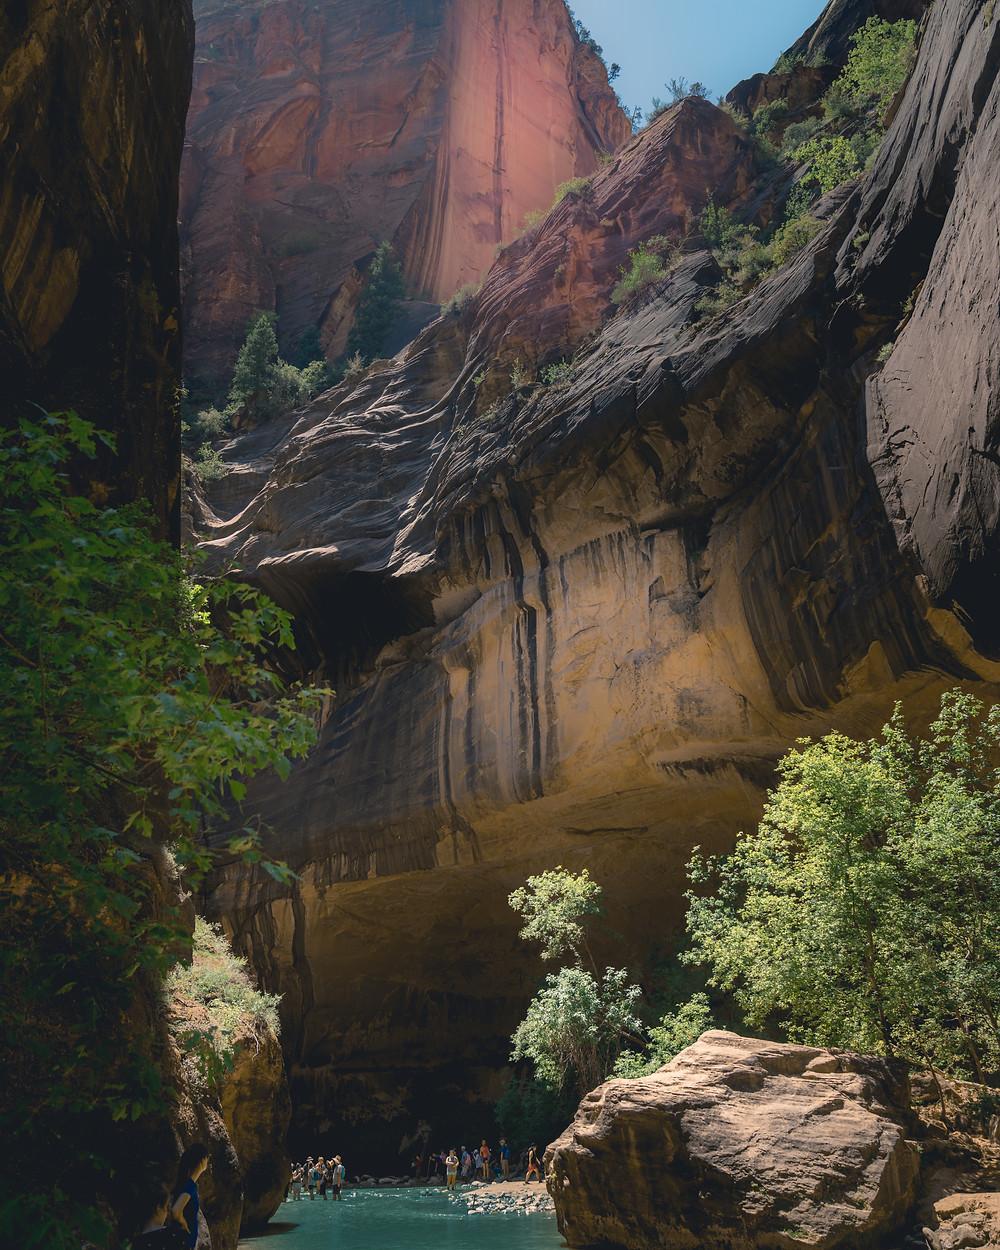 Slot canyons of the narrows hike in Utah